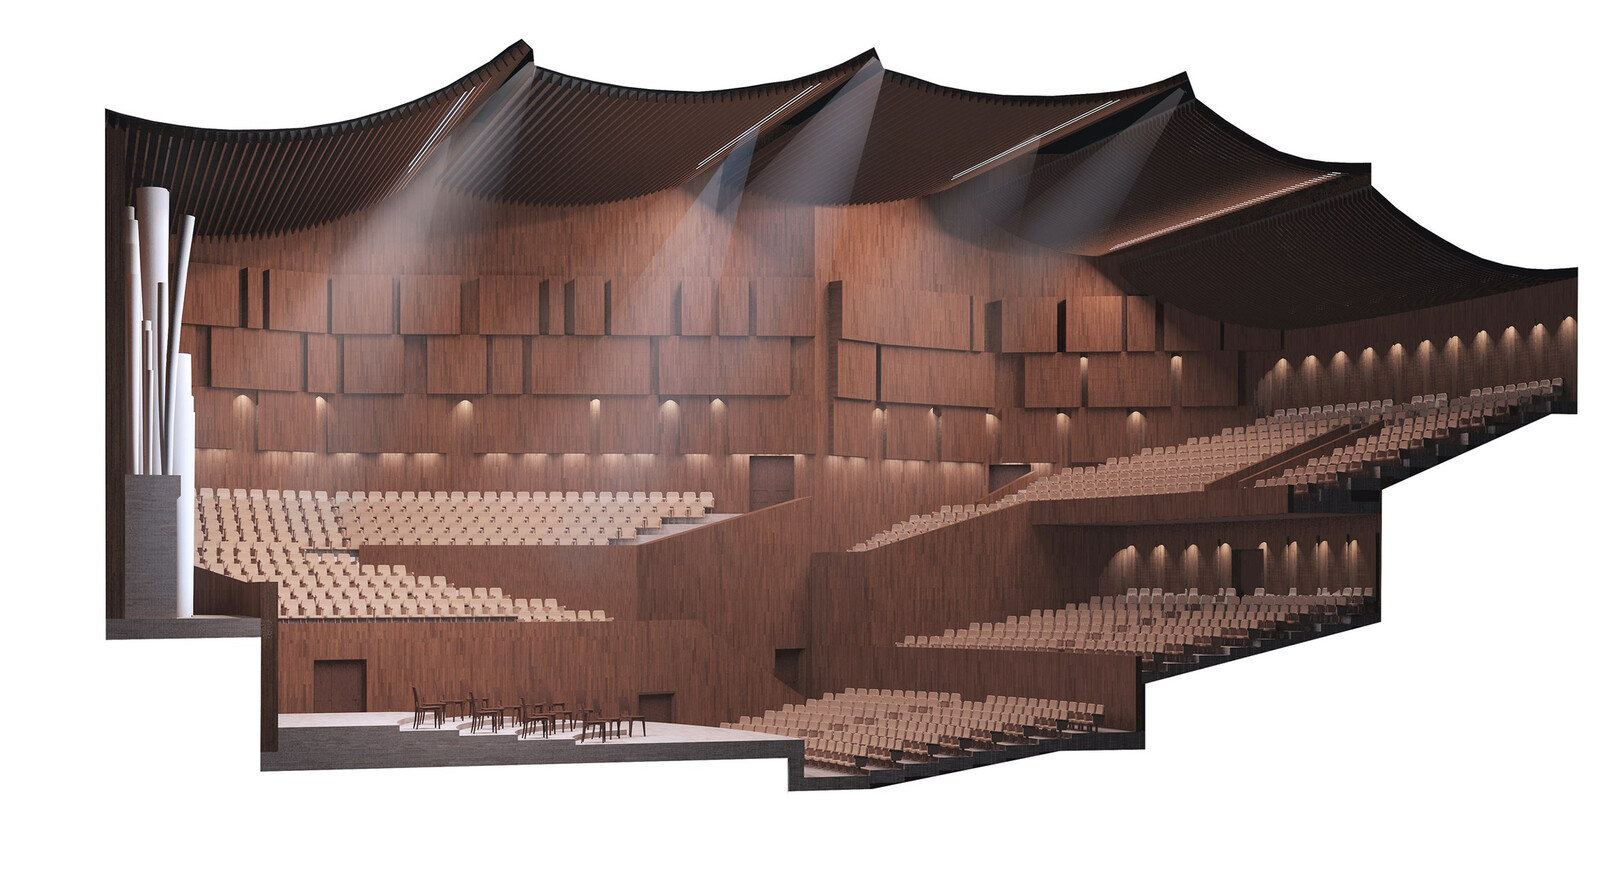 Concert Hall project. Interior. (MArchI, 2013)